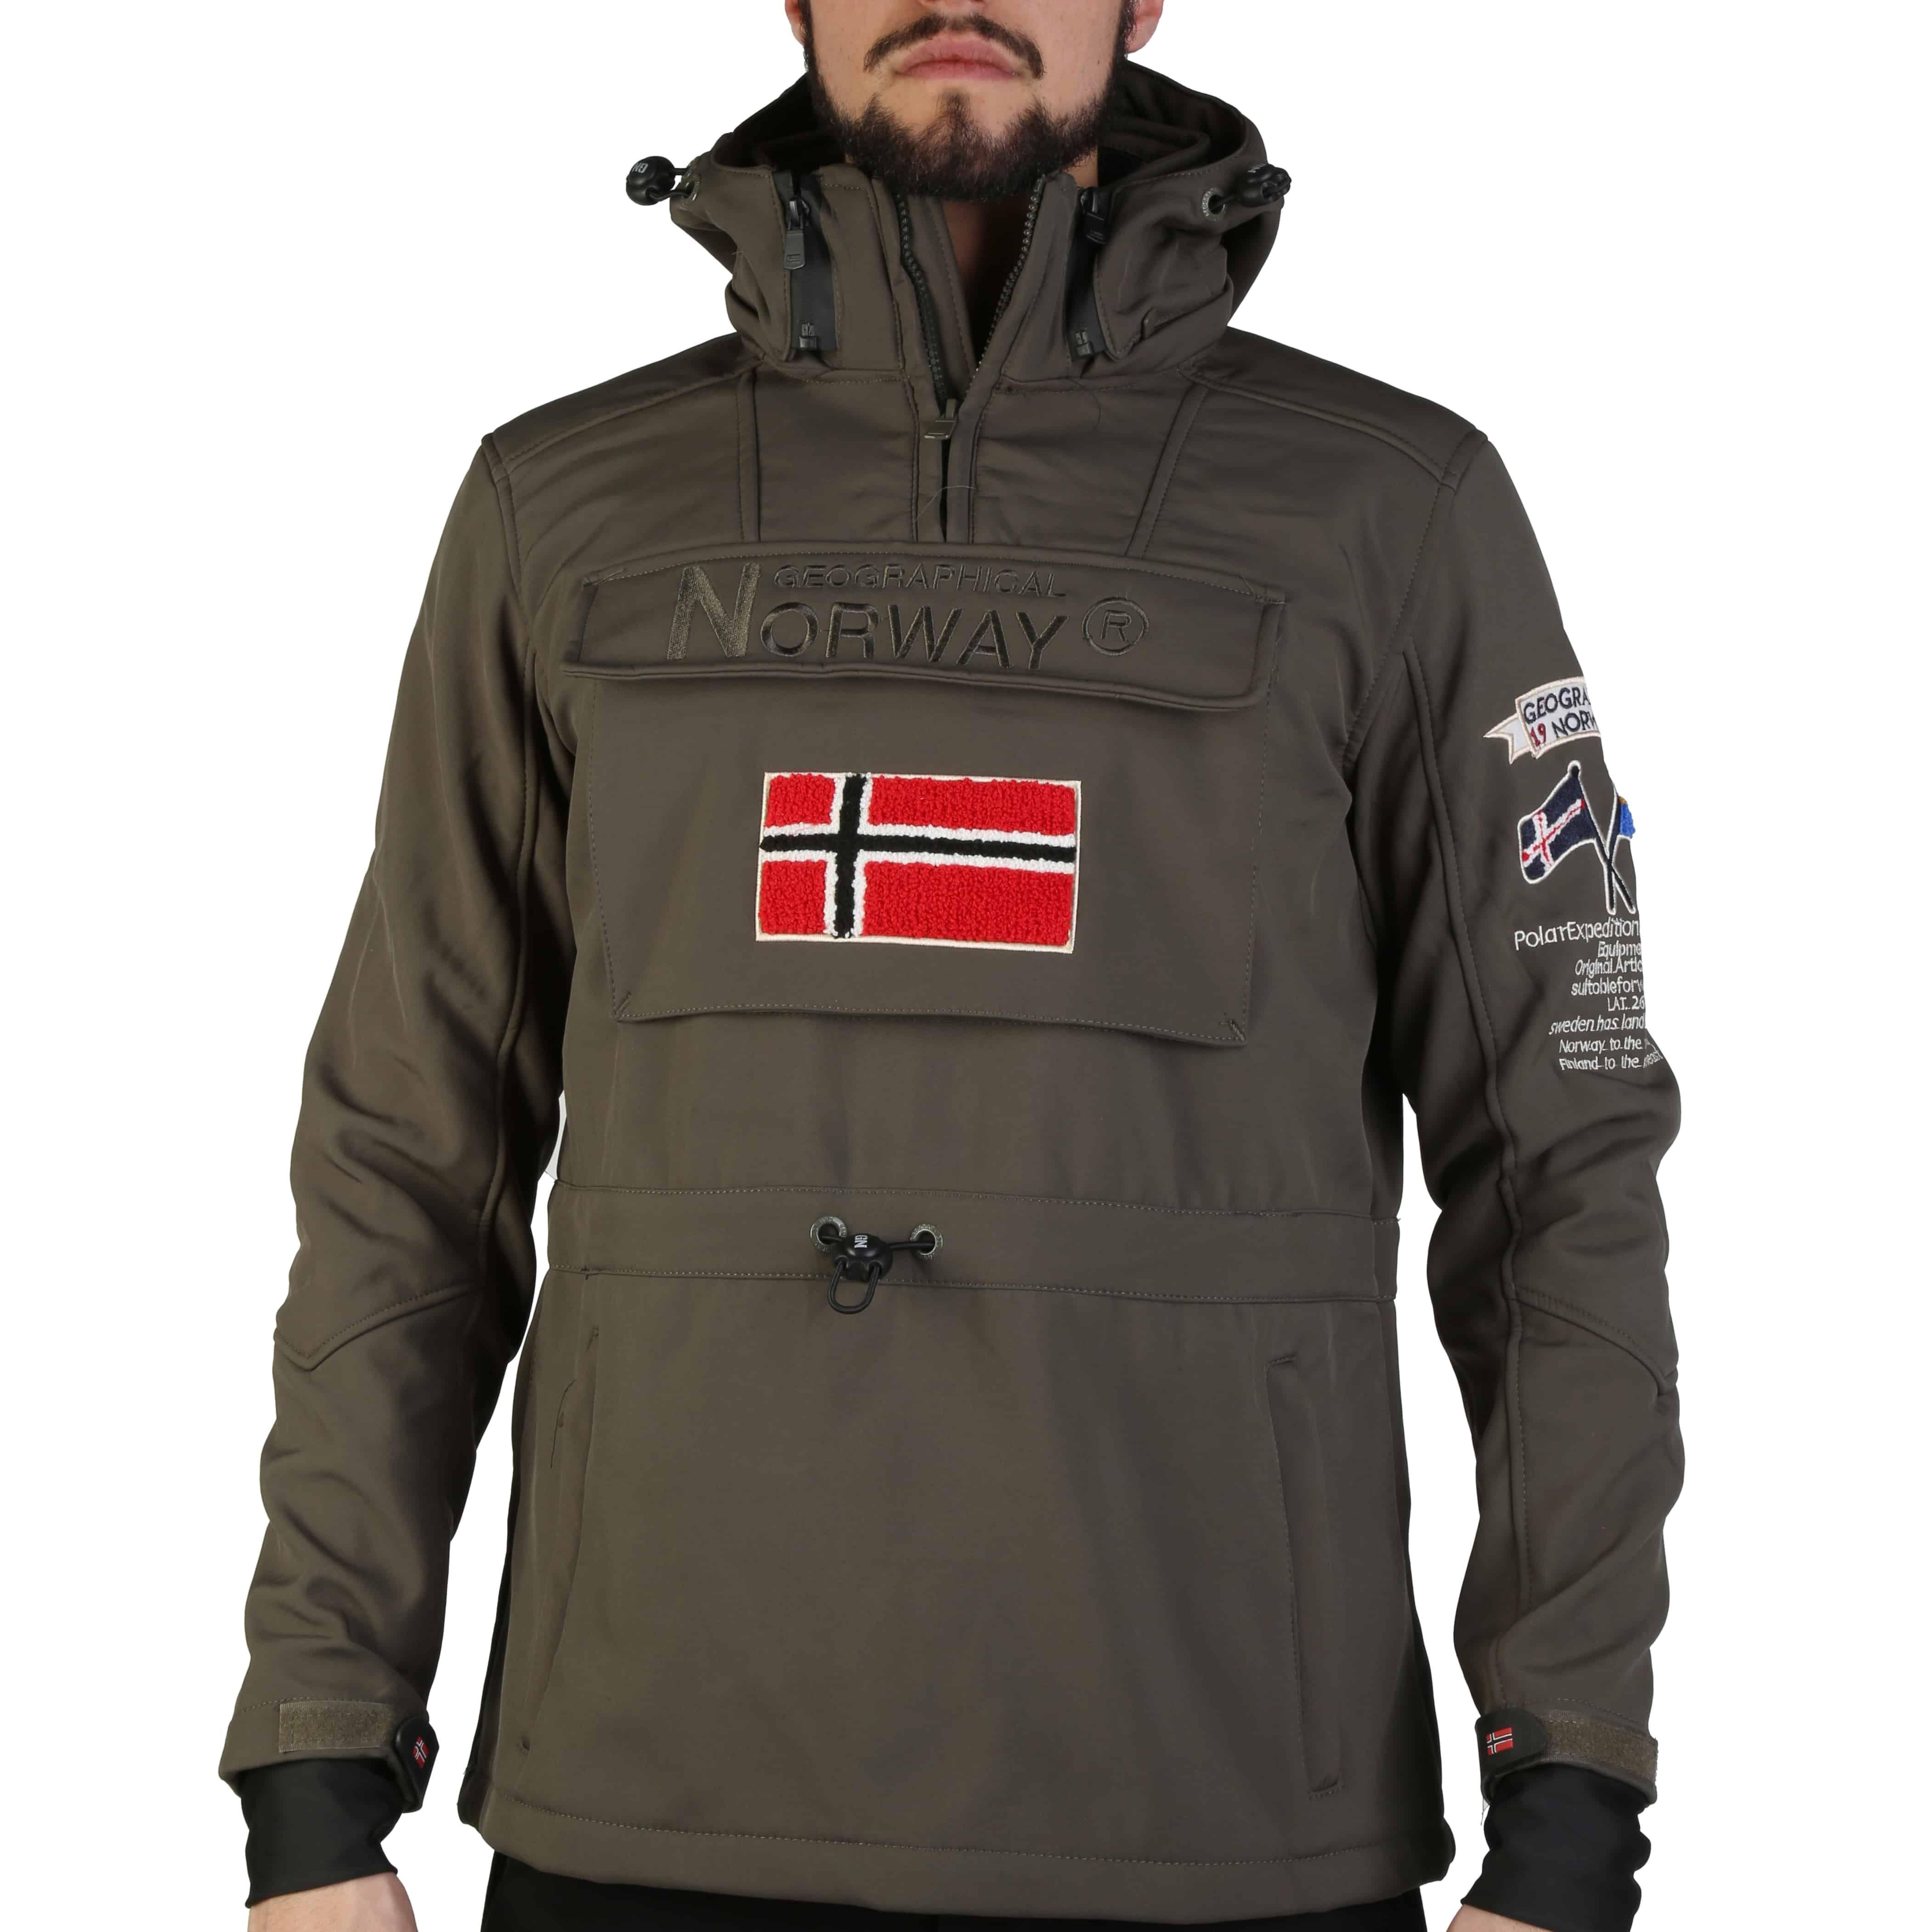 Geographical Norway – Target_man – Groen Designeritems.nl